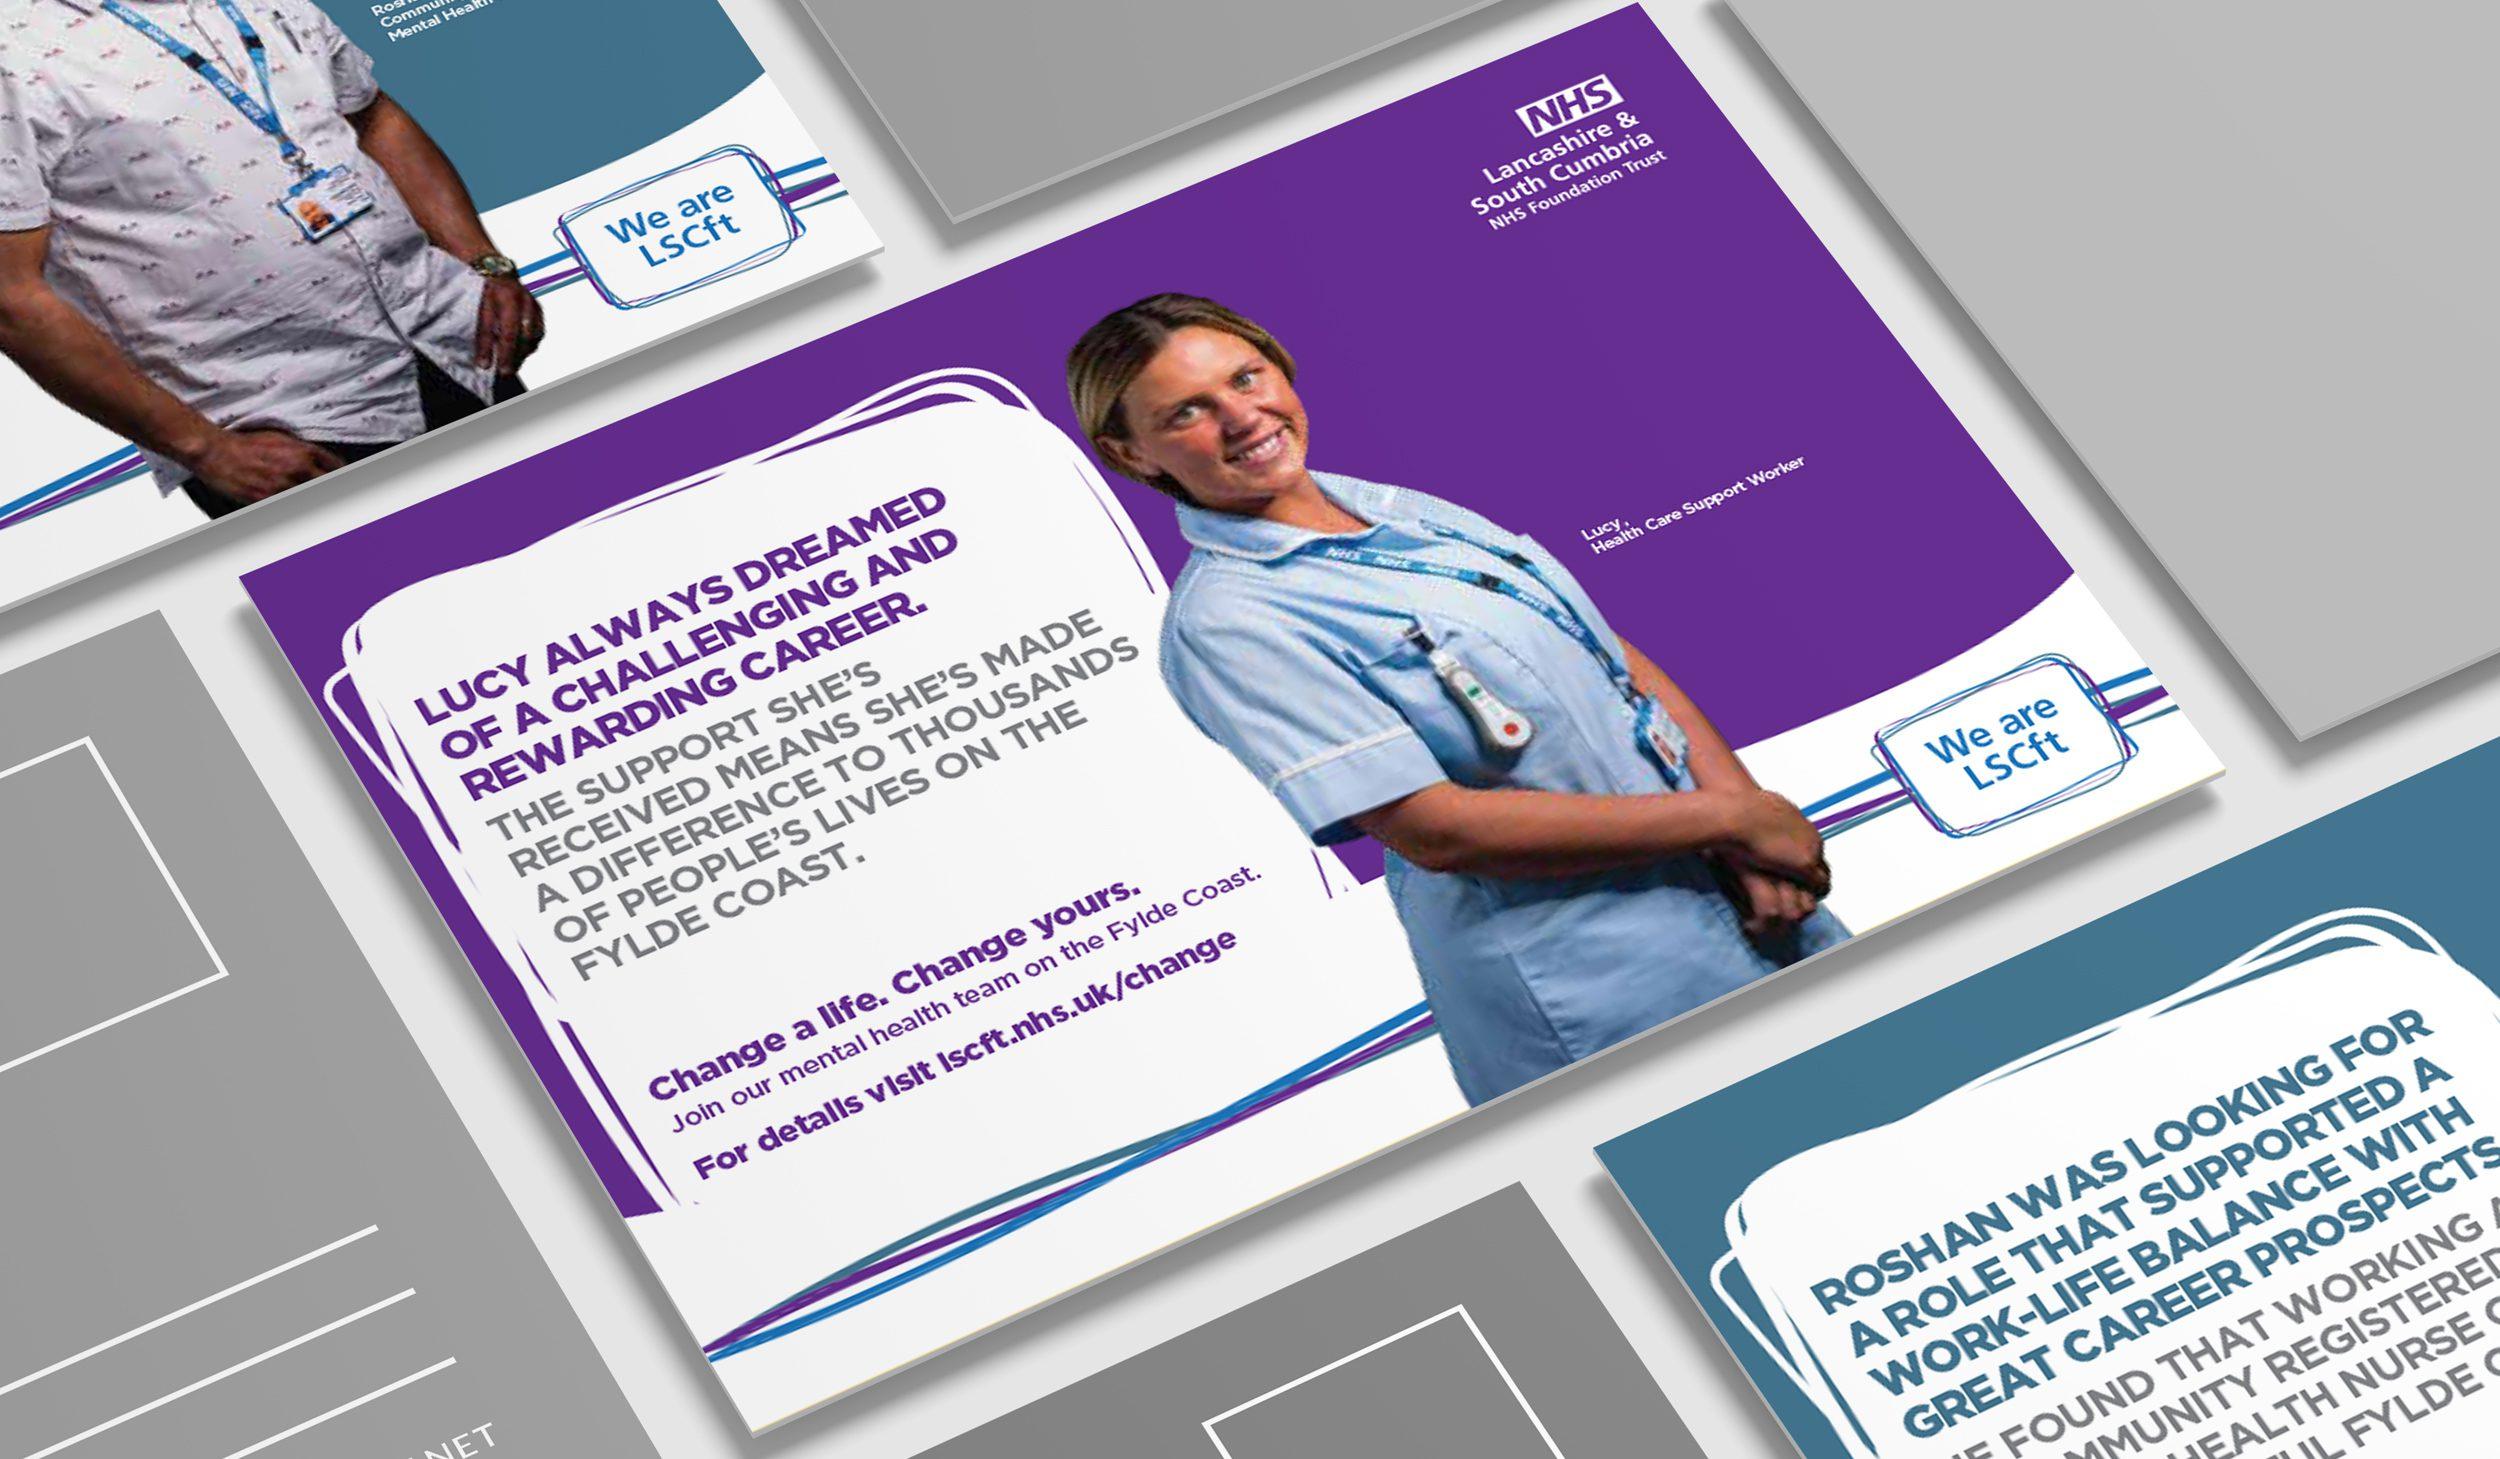 Lancashire & South Cumbria NHS Foundation Trust